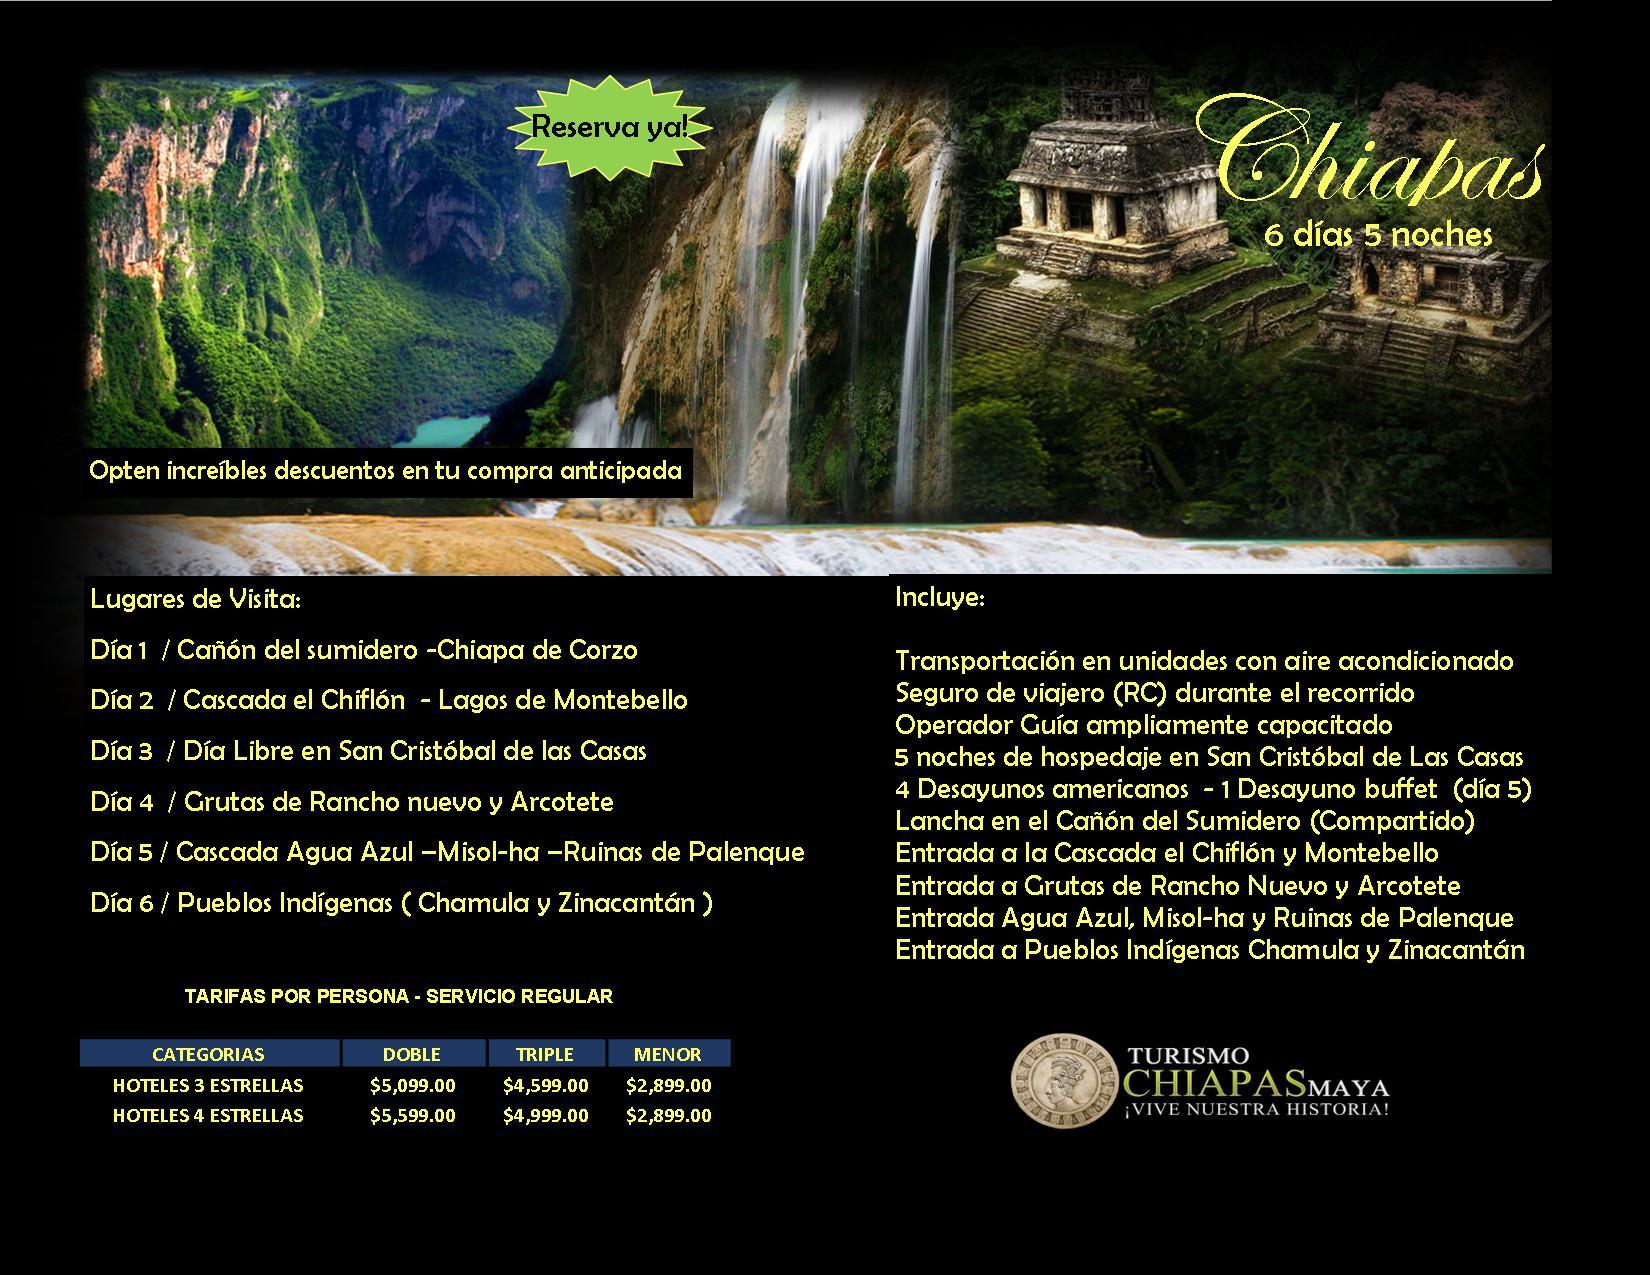 Foto de Agencia de Viajes & Tour Operador  - Turismo Chiapas Maya